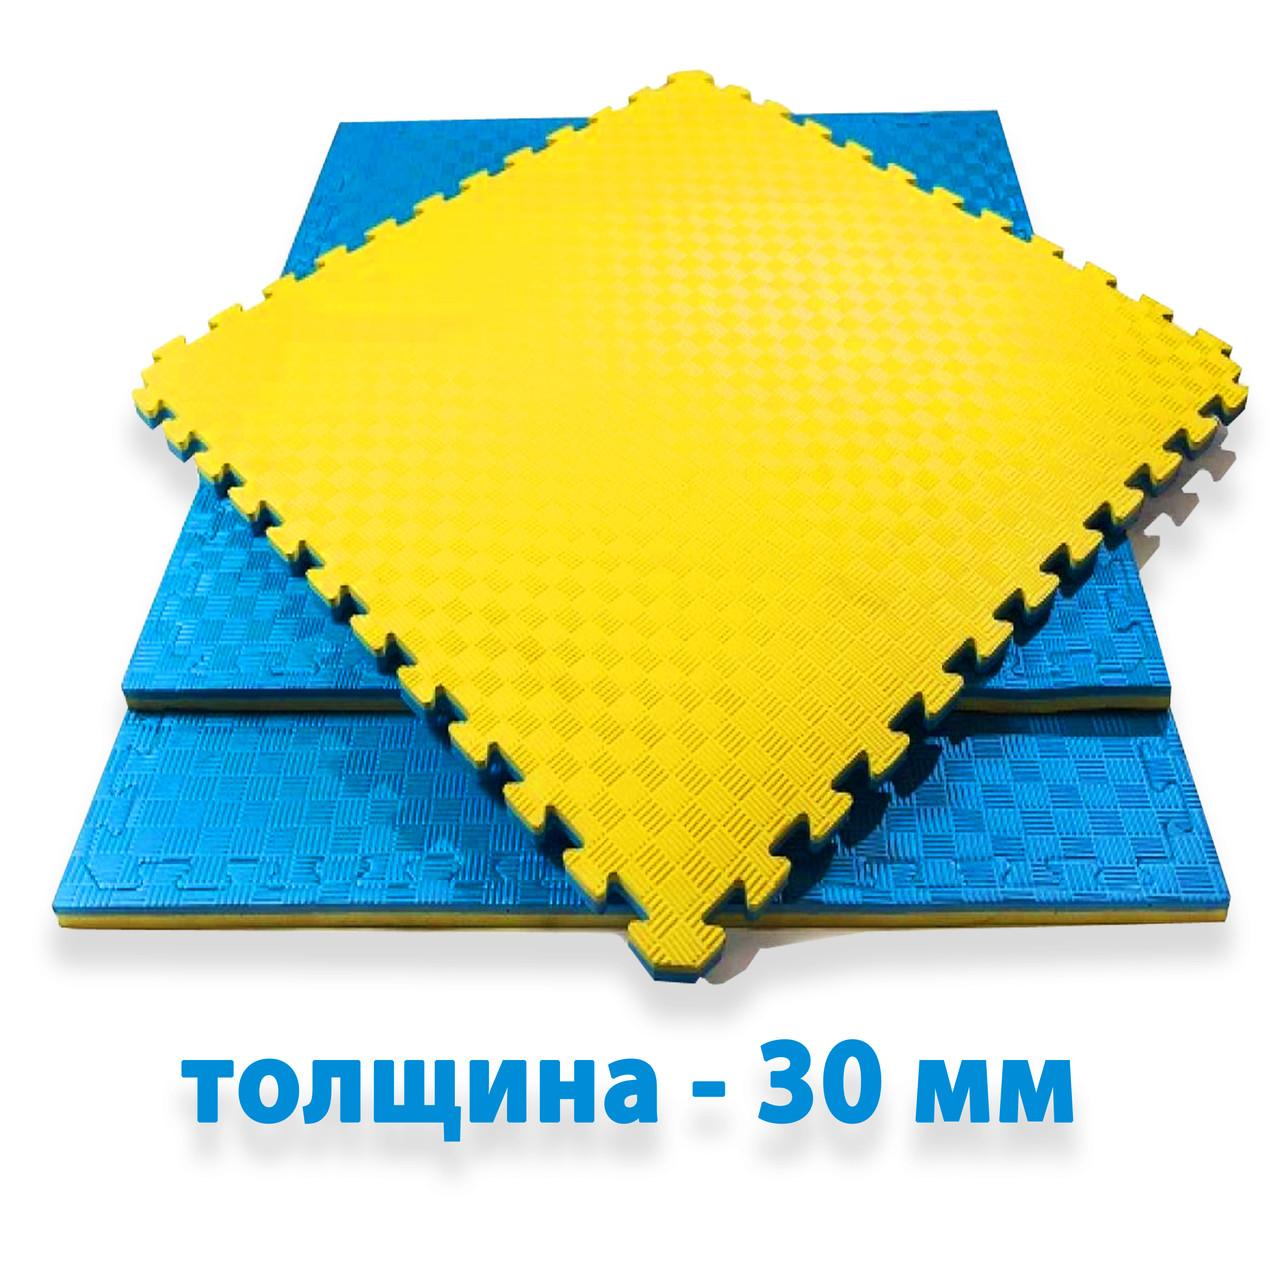 Спортивный мат (ТАТАМИ) 30 мм EVA (Турция), желто-синий